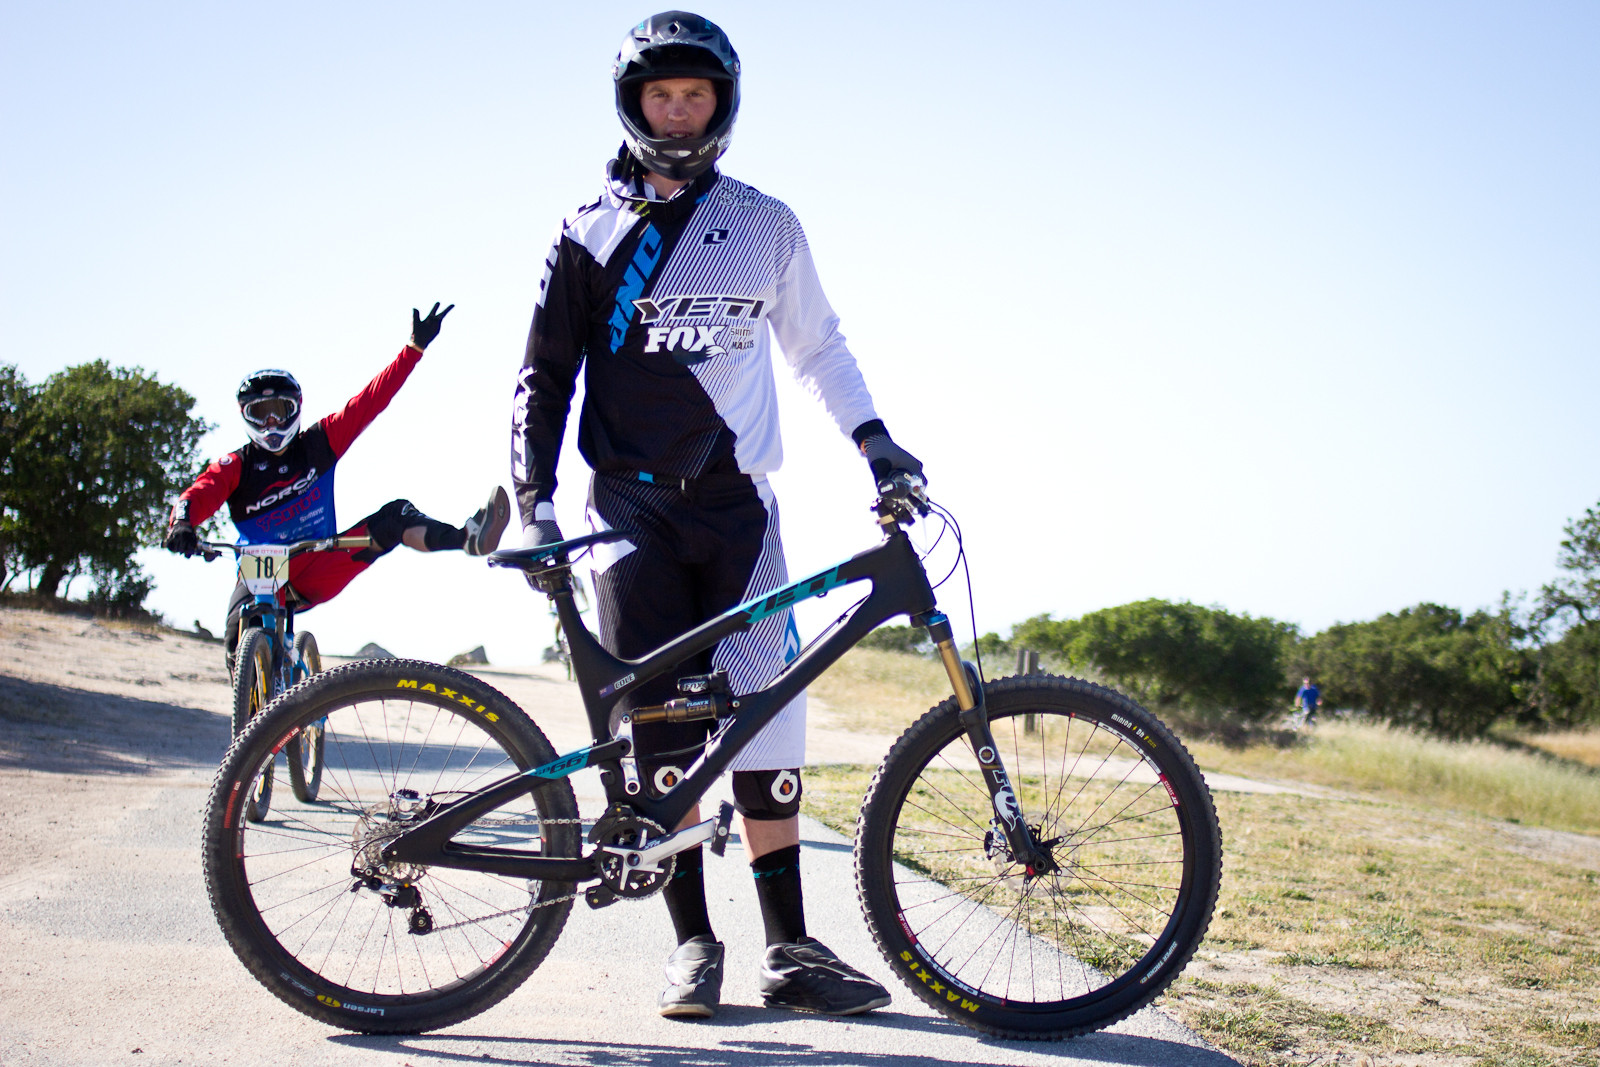 Pro Dual Slalom Bikes: Cam Cole's Custom Yeti SB-66 Dual Slalom Bike - 2013 Sea Otter Pro Slalom Bikes - Mountain Biking Pictures - Vital MTB